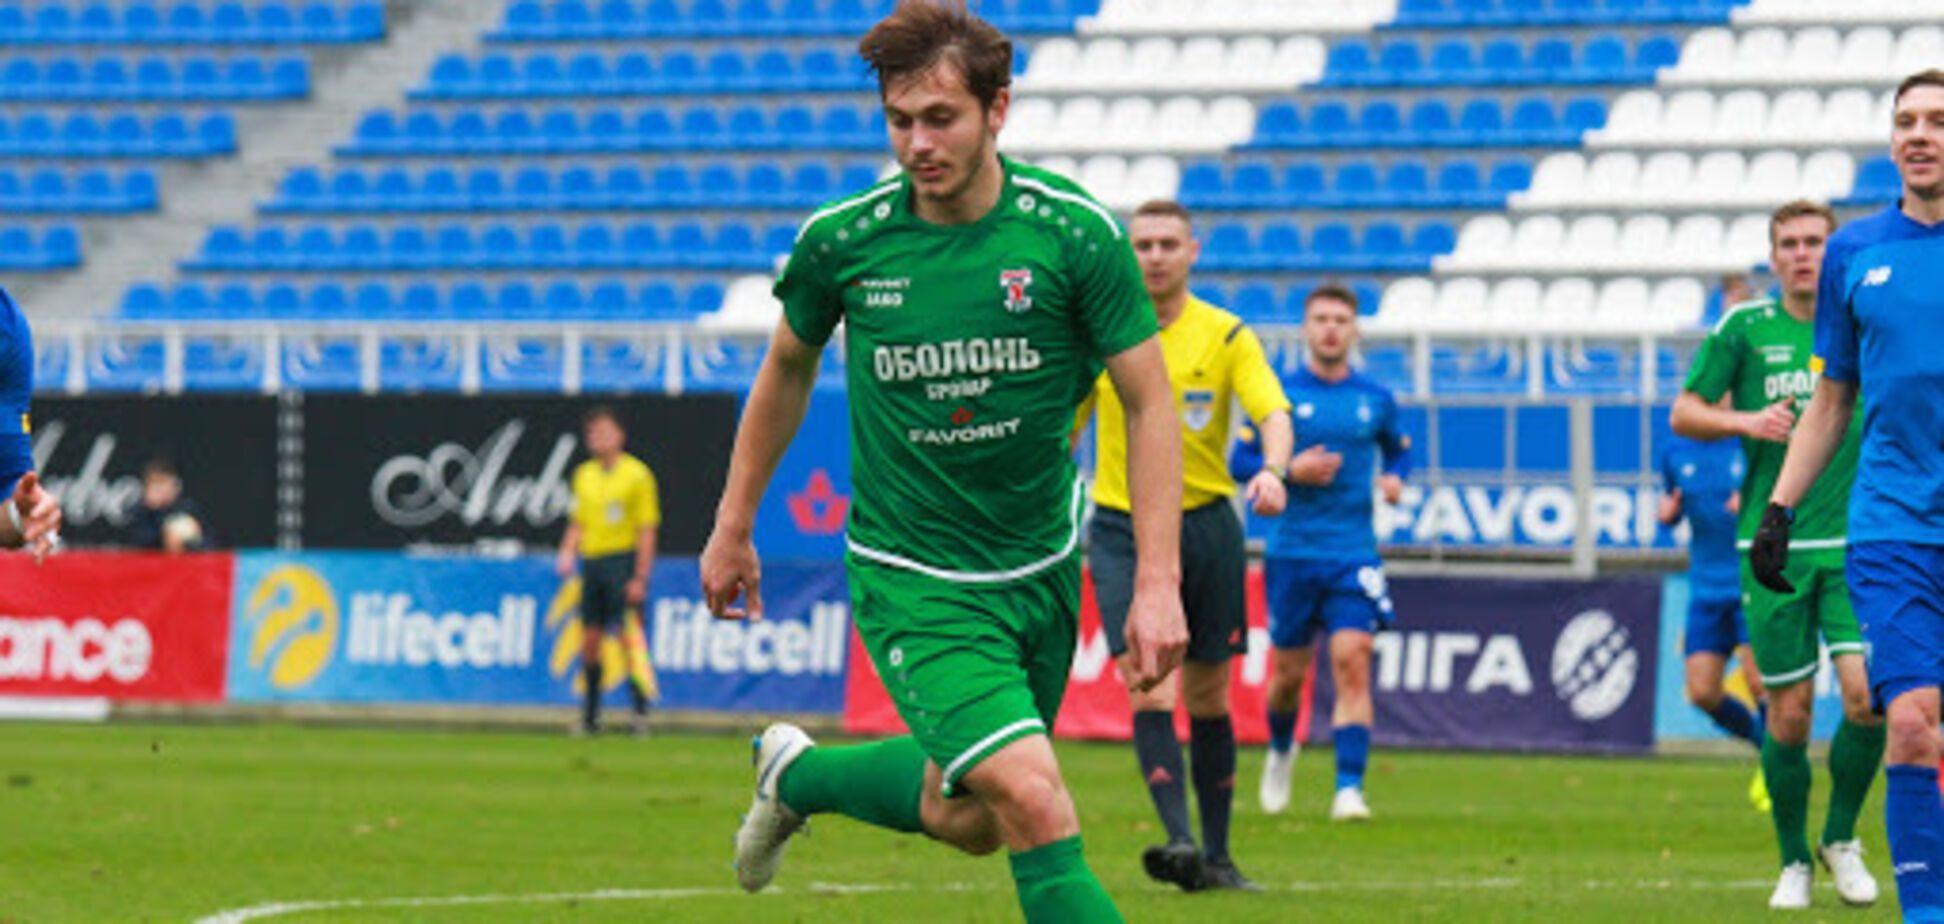 Украинский футболист забил фантастический гол с 40 метров. Видео